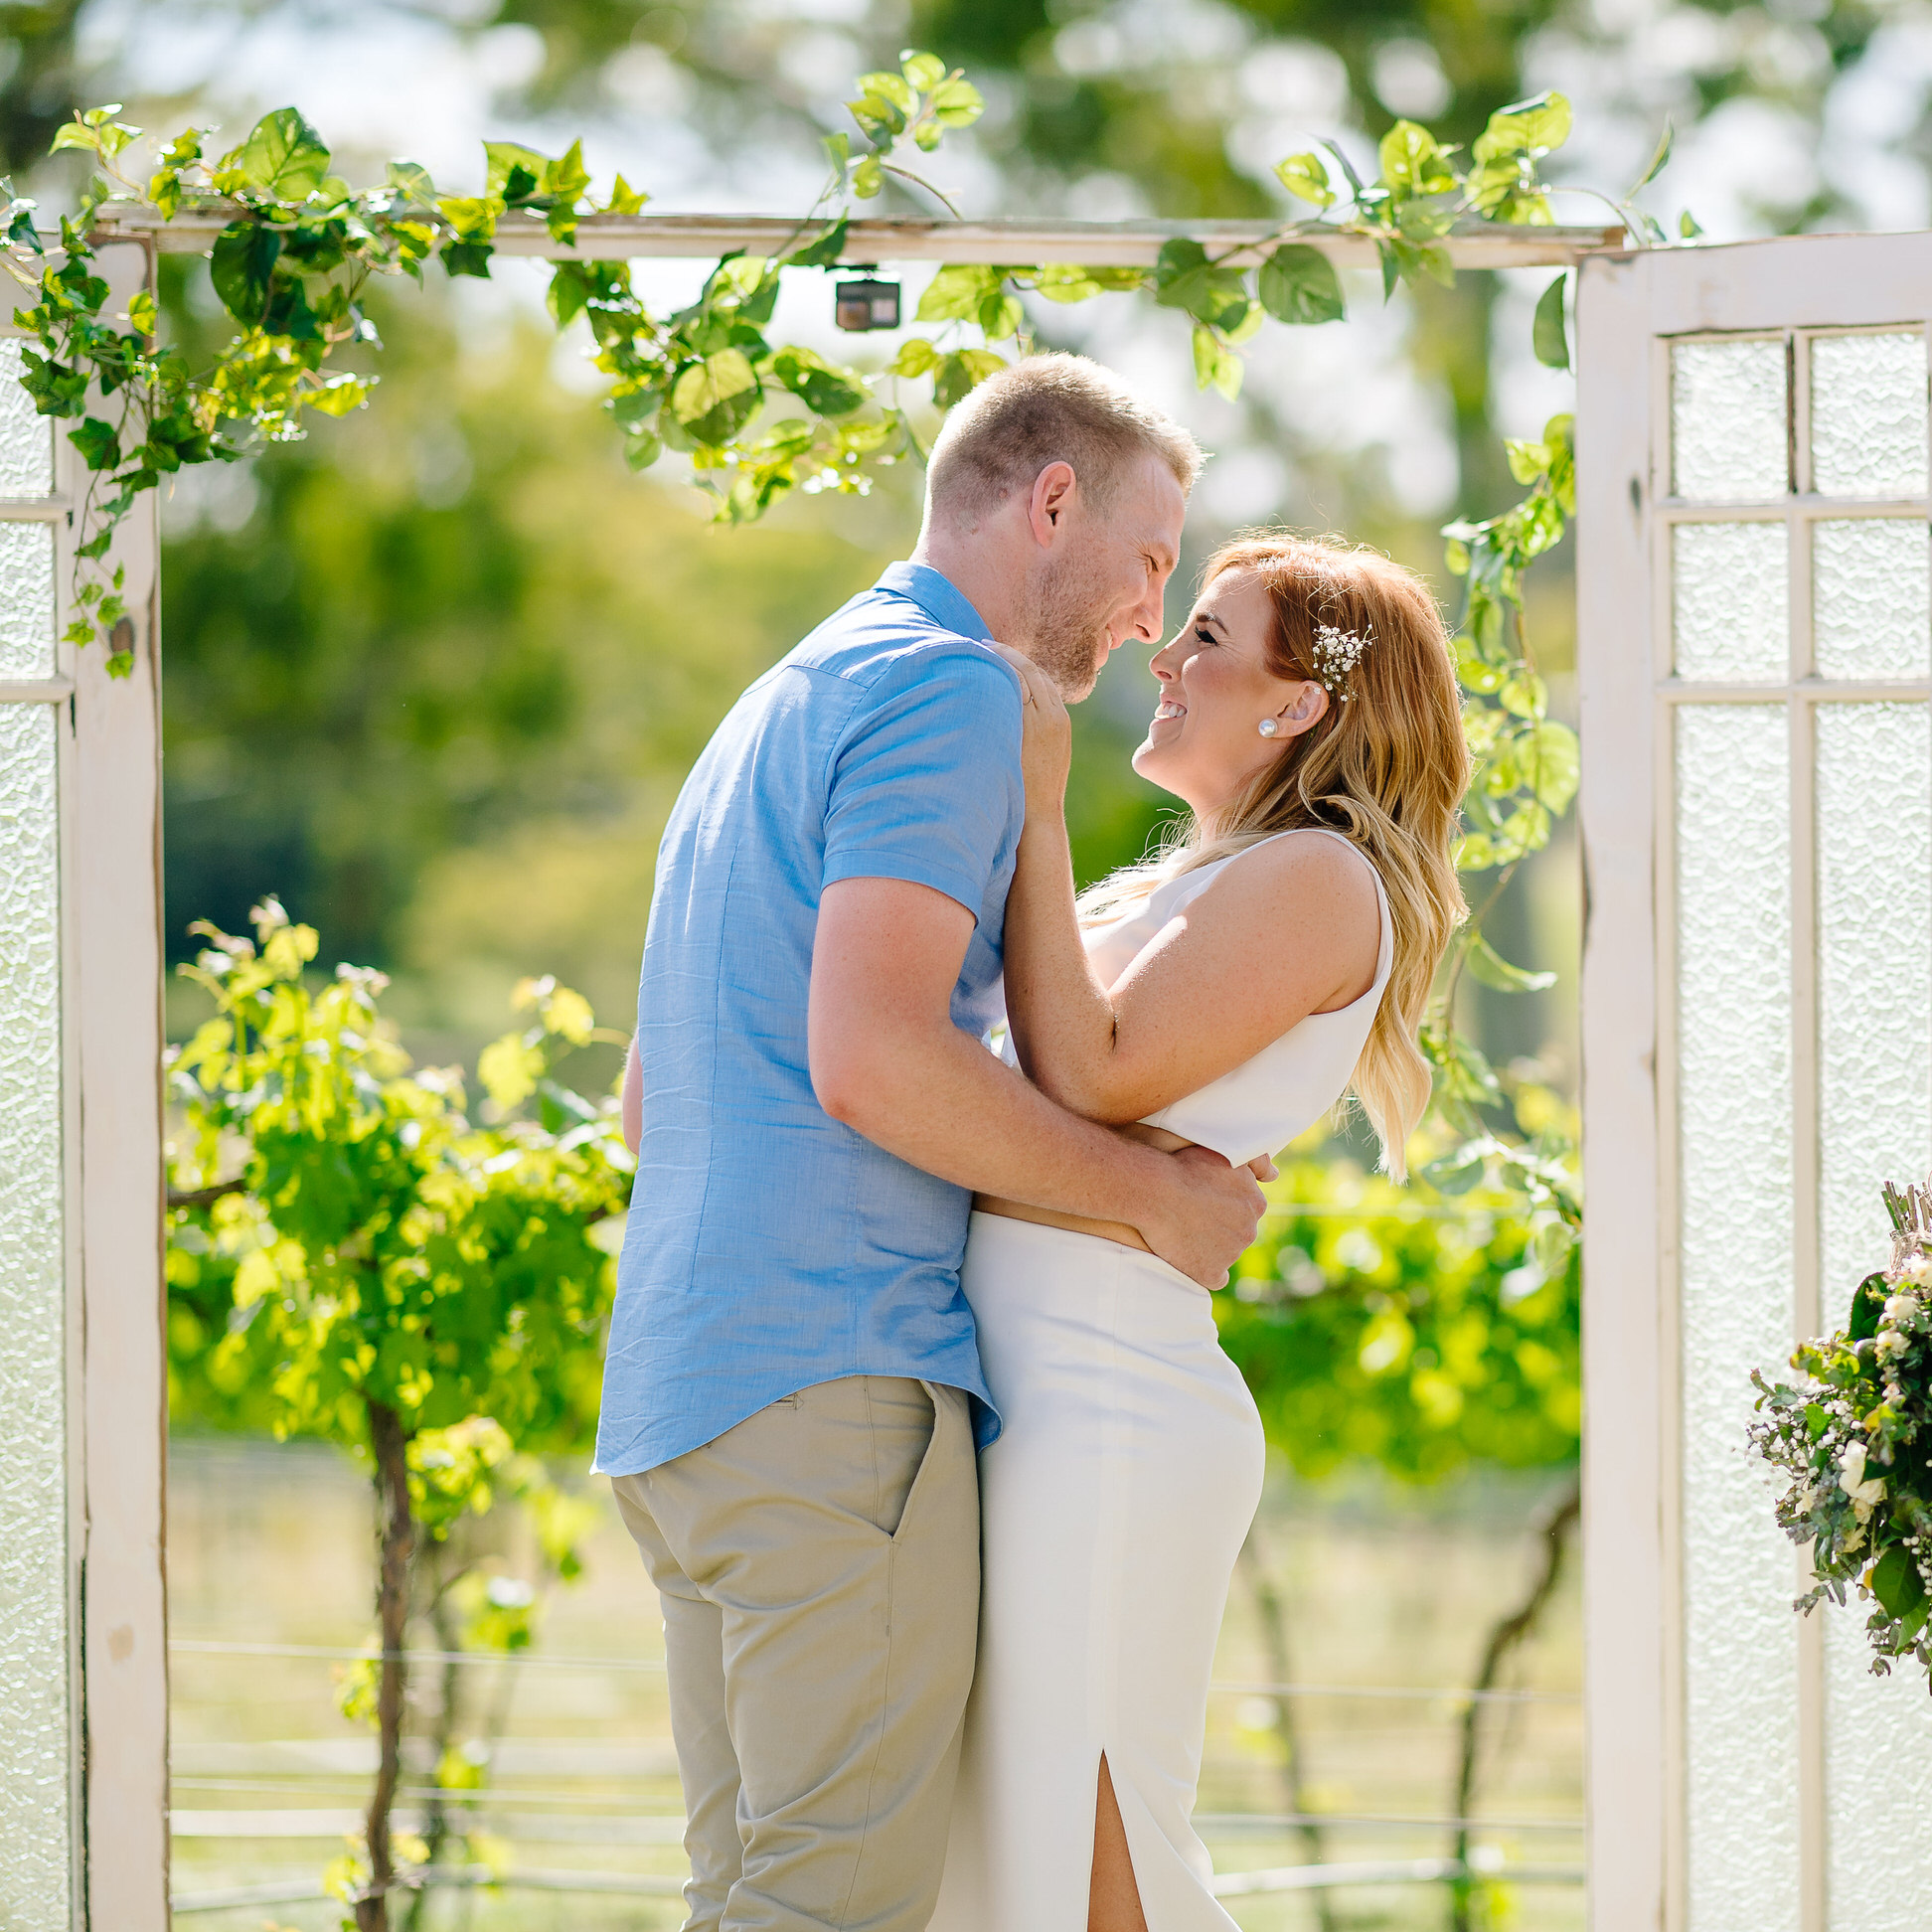 Bendigo_Wedding_Photography_Justin_Jim_BelvoirPark-165.JPG